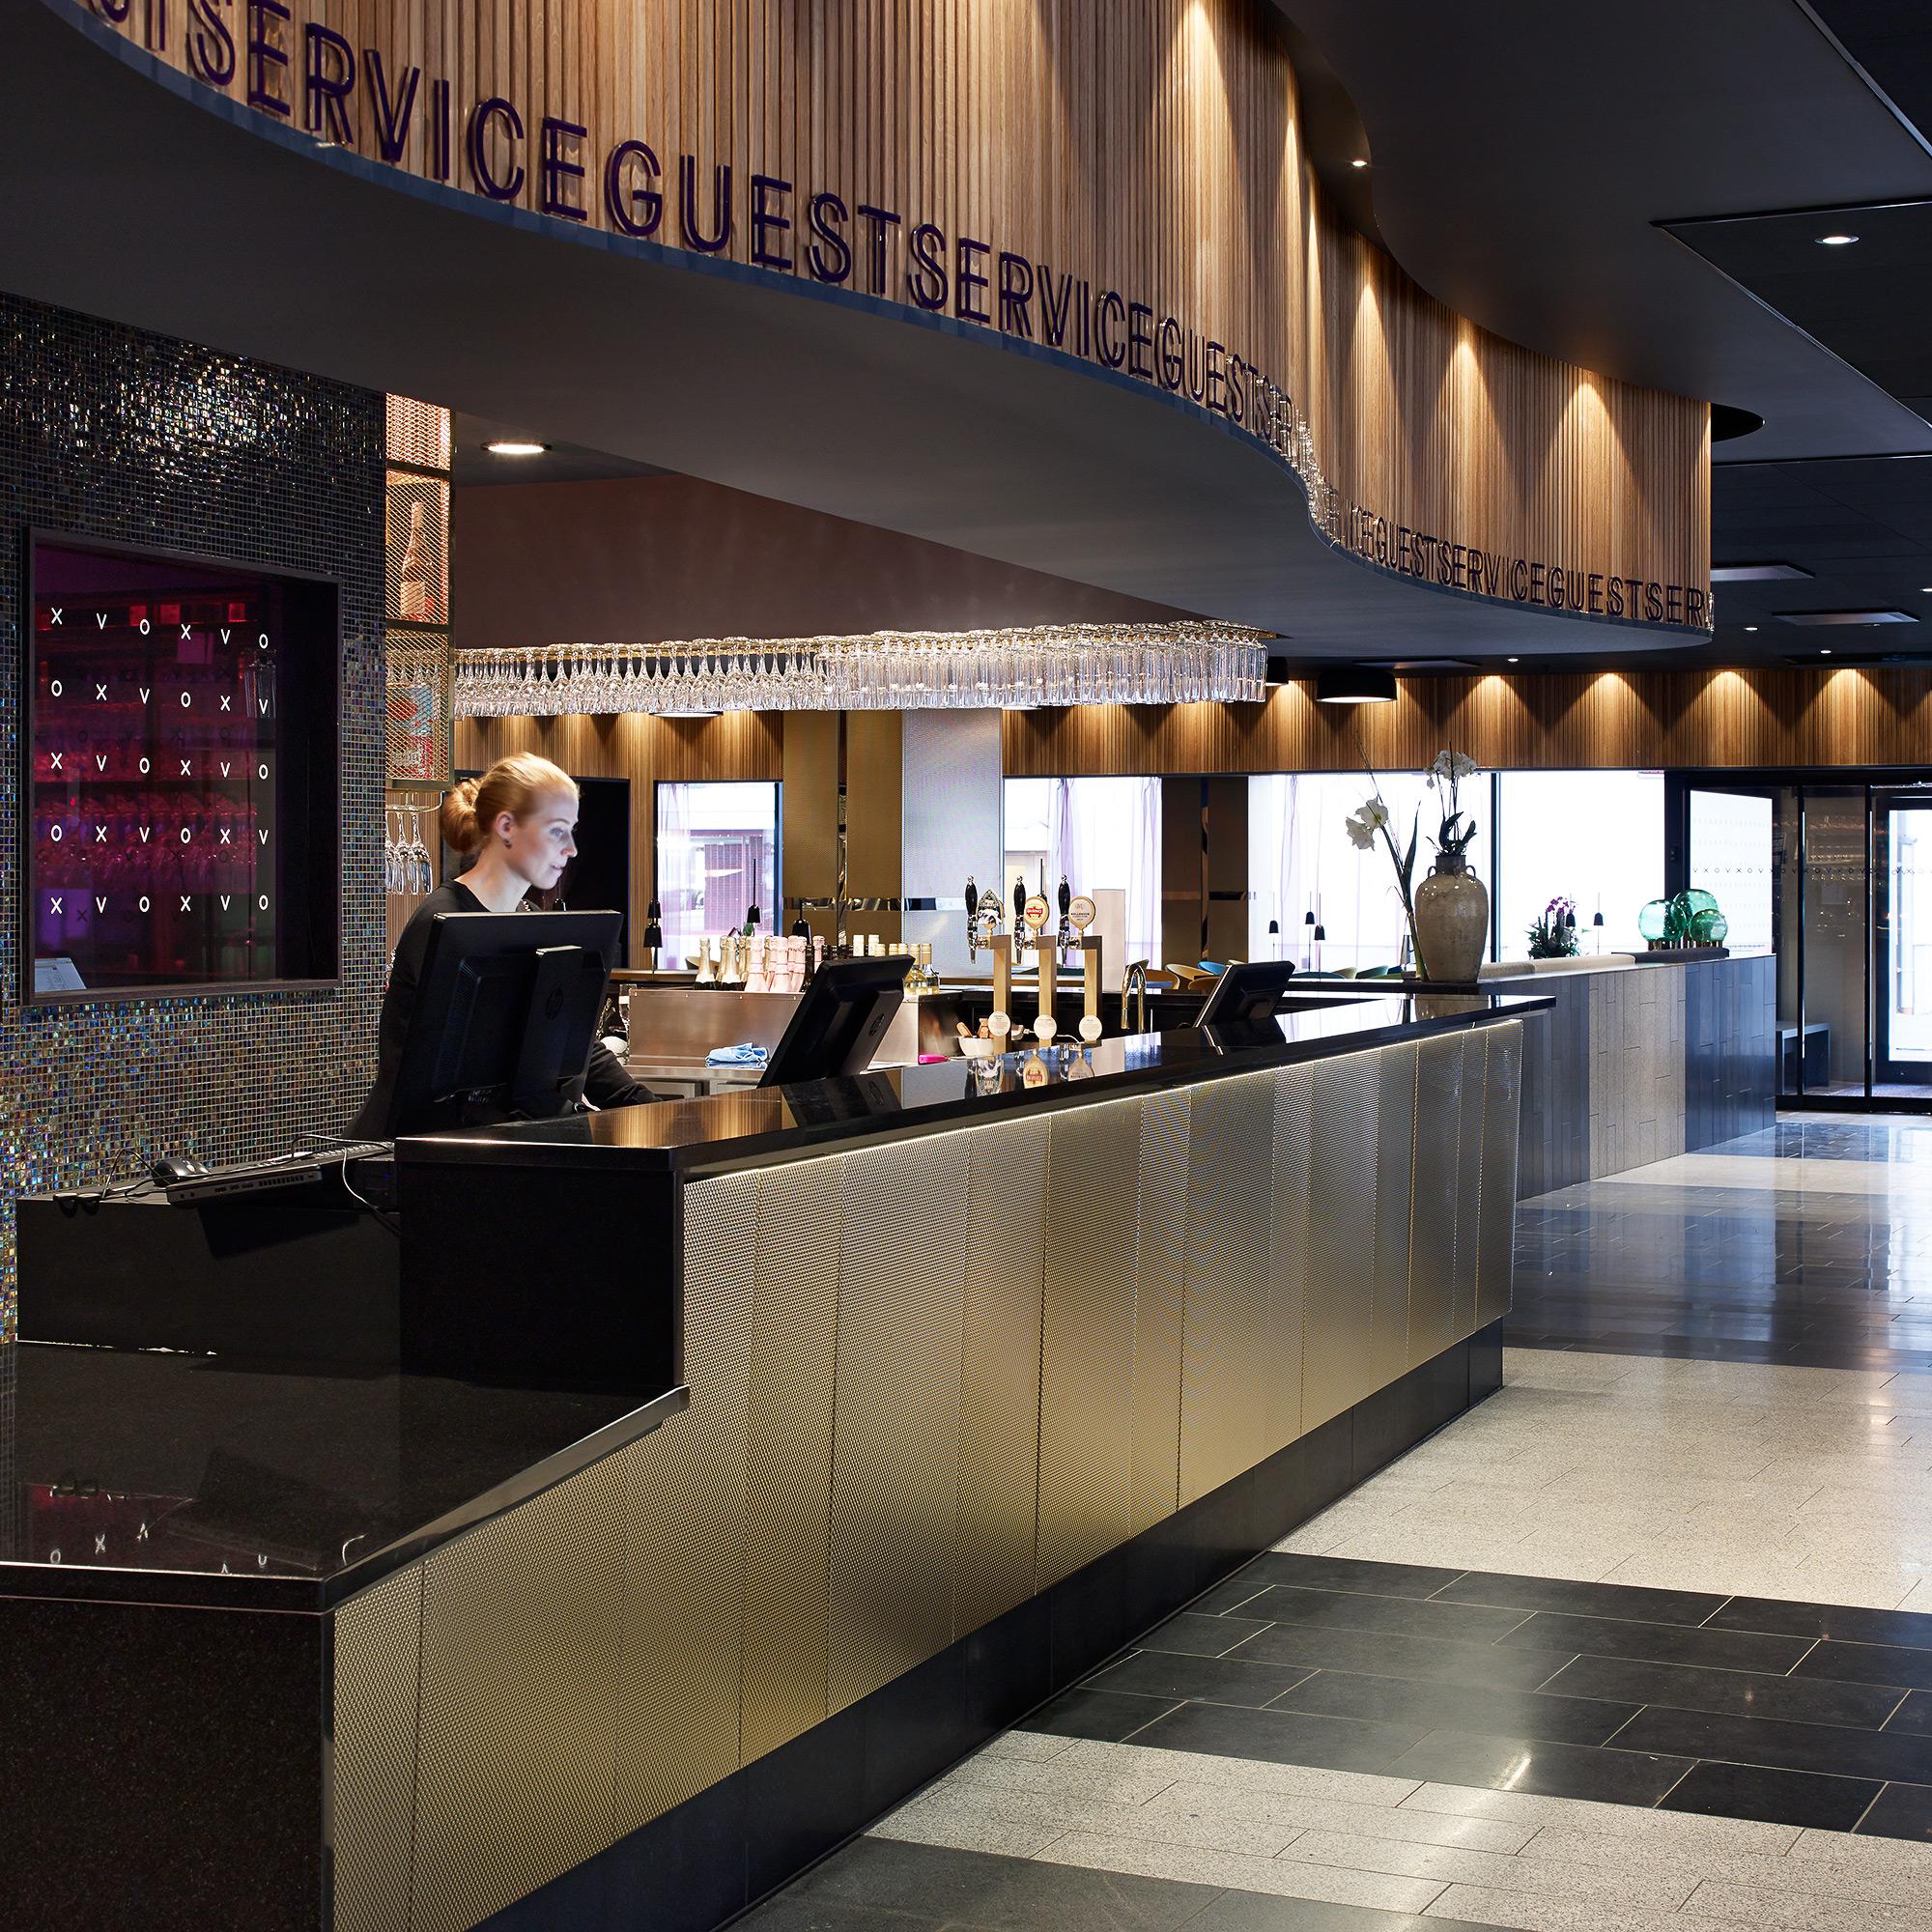 Vox Hotel  Semrén & Månsson